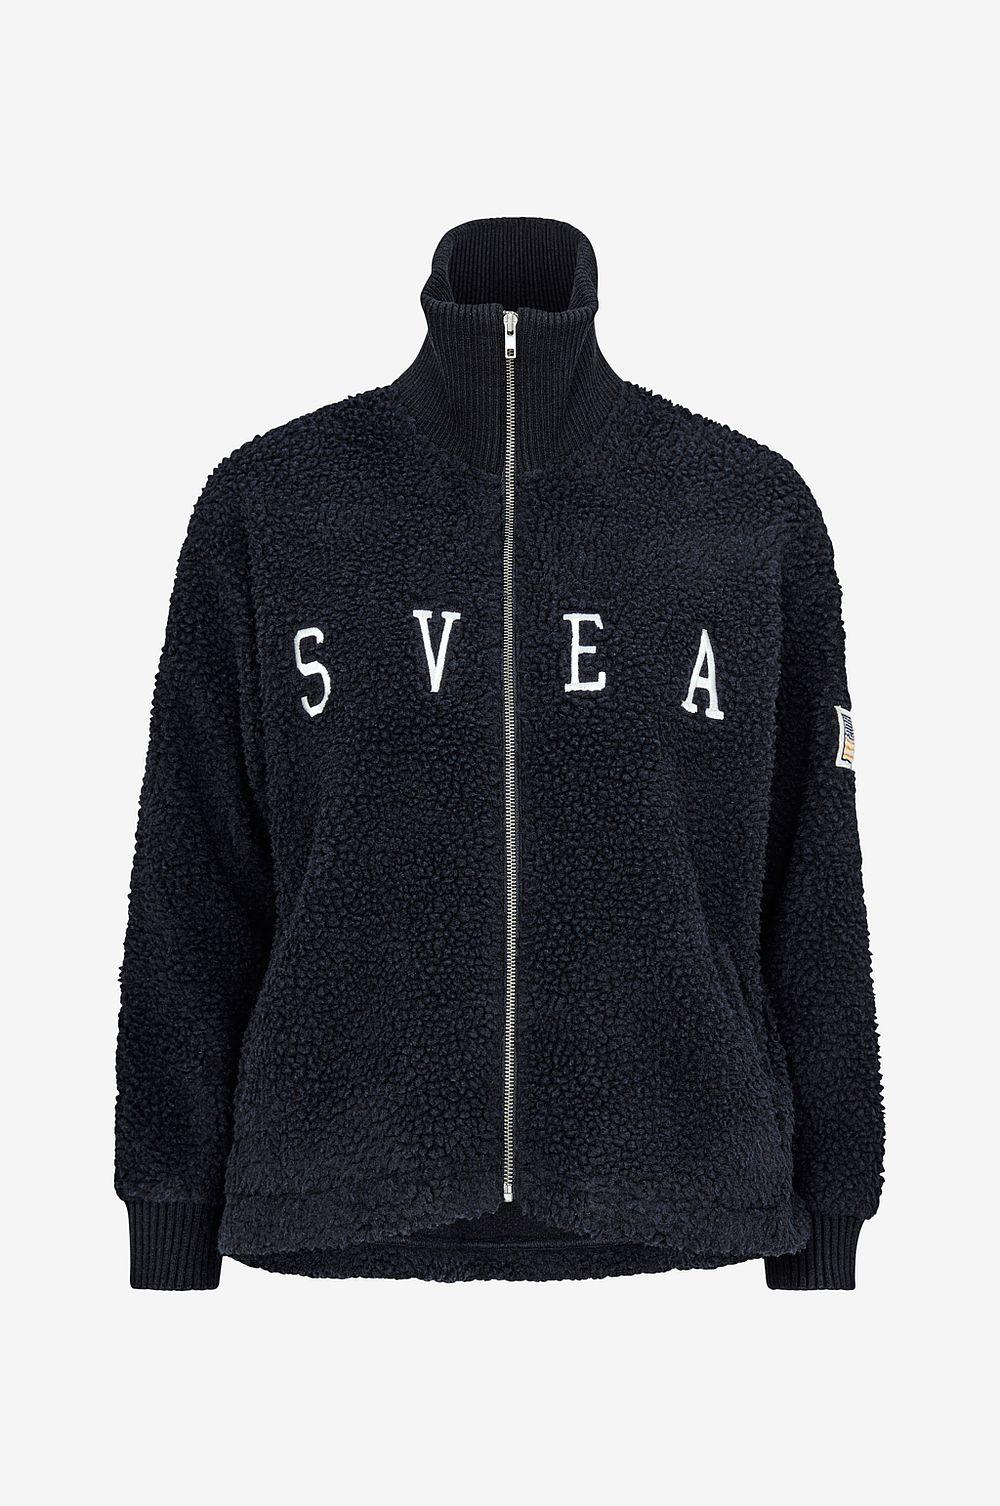 Svea Tröja Kathryn Pile Zip Sweater Blå Dam klassisk